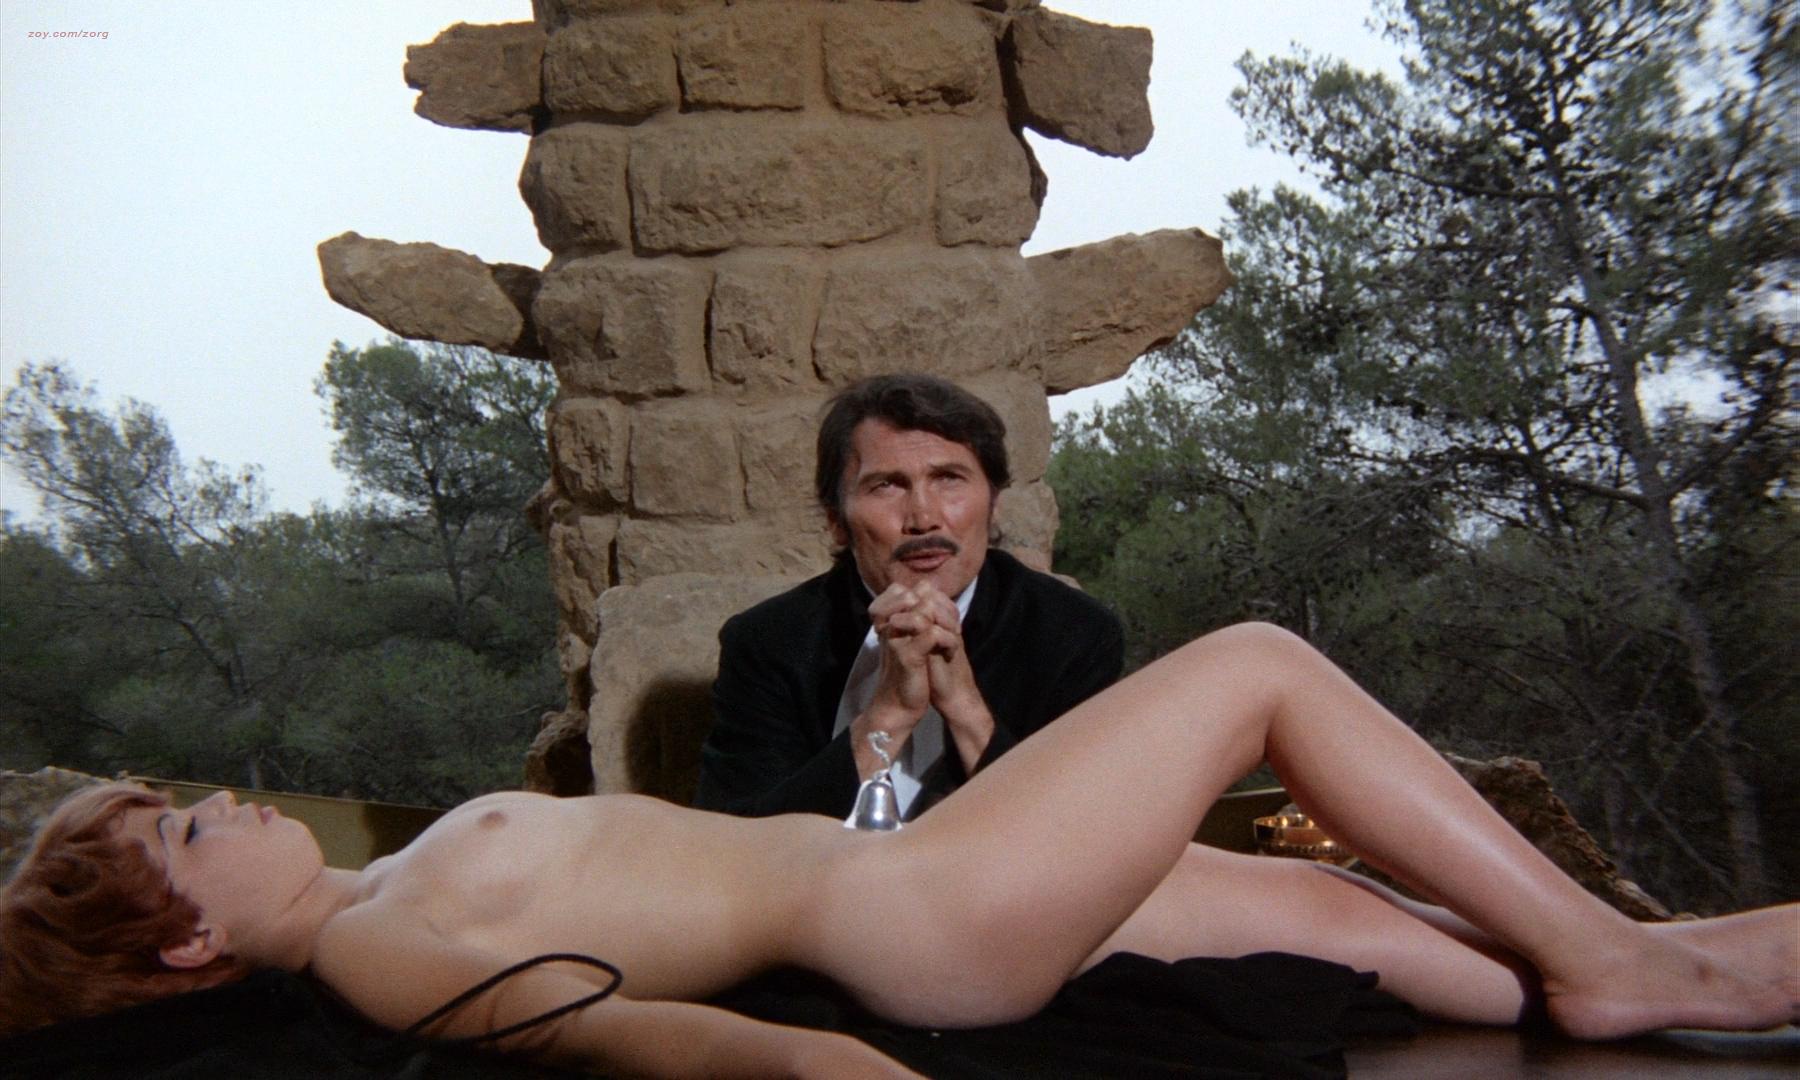 Romina Power nude toplees, Sylva Koscina nude Rosemary Dexter and Maria Rohm nude bush - Marquis de Sade - Justine (IT-1969) HD 1080p BluRay (7)